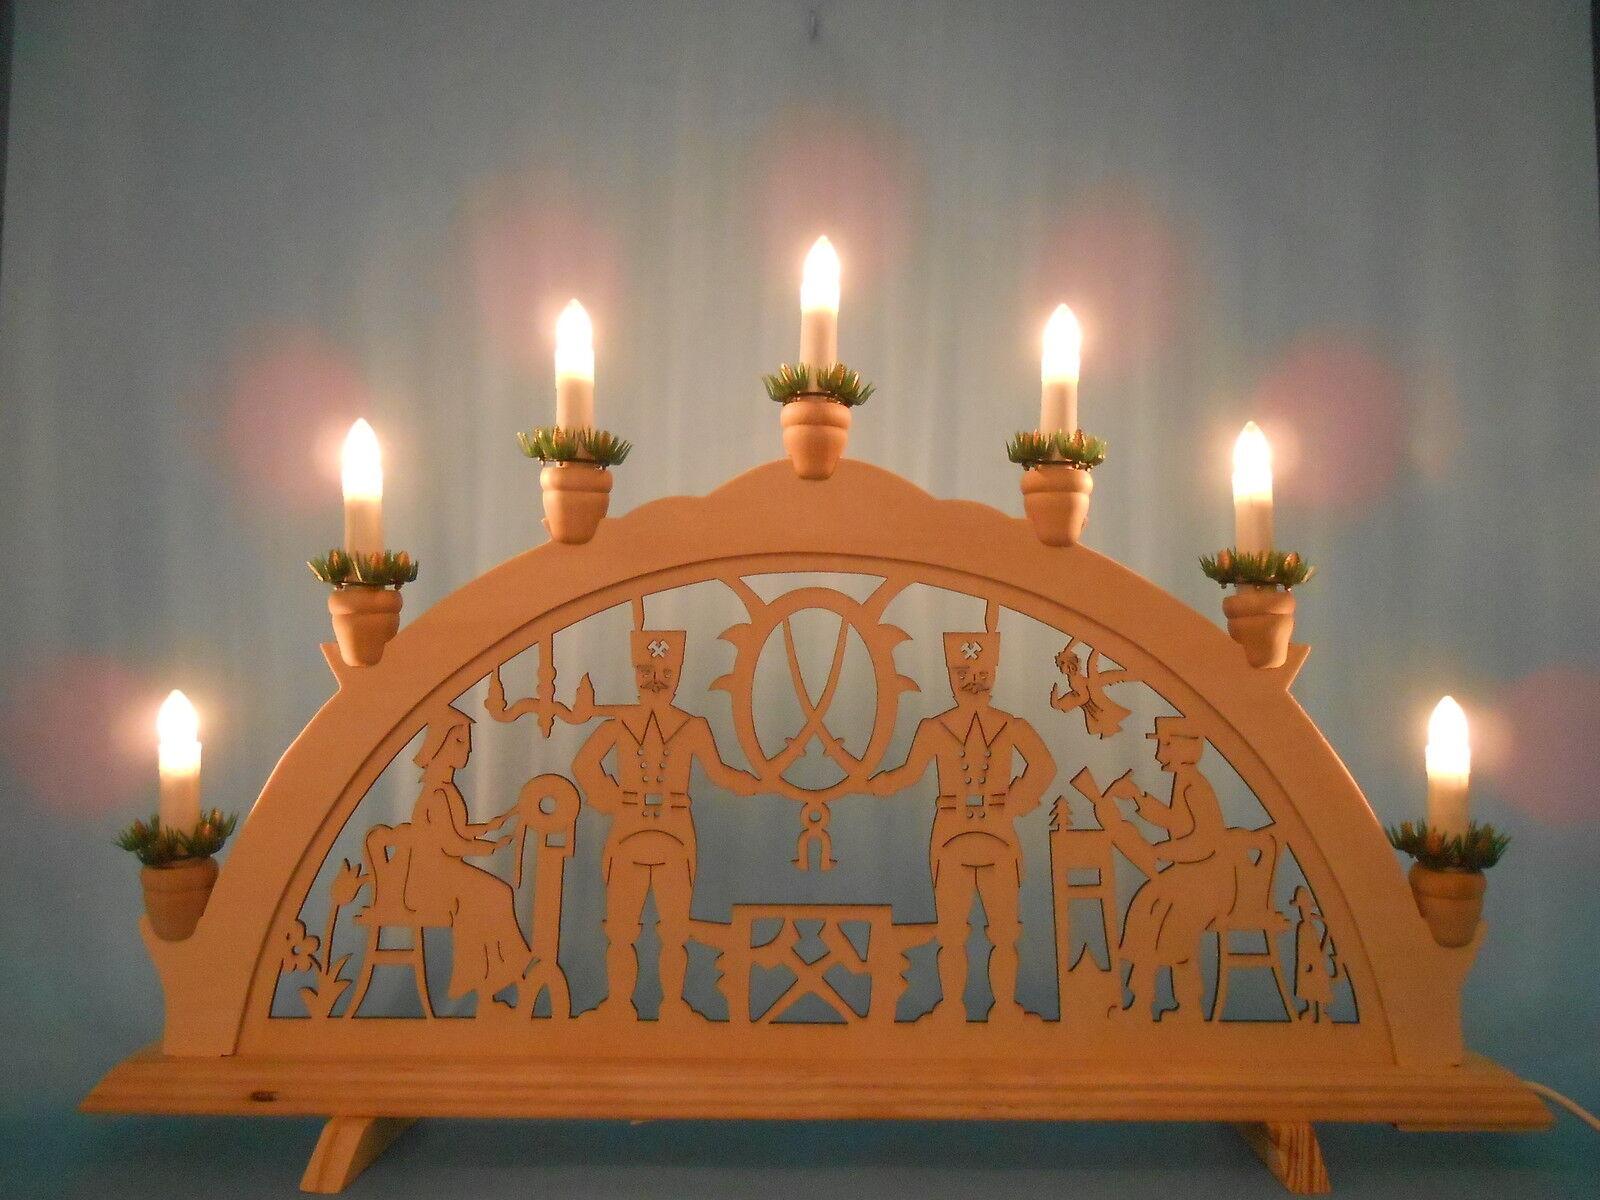 Schwibbogen arco di luci illuminazione finestra motivo Bergmann Bergmann Bergmann klöpplerin NUOVO 539a9e